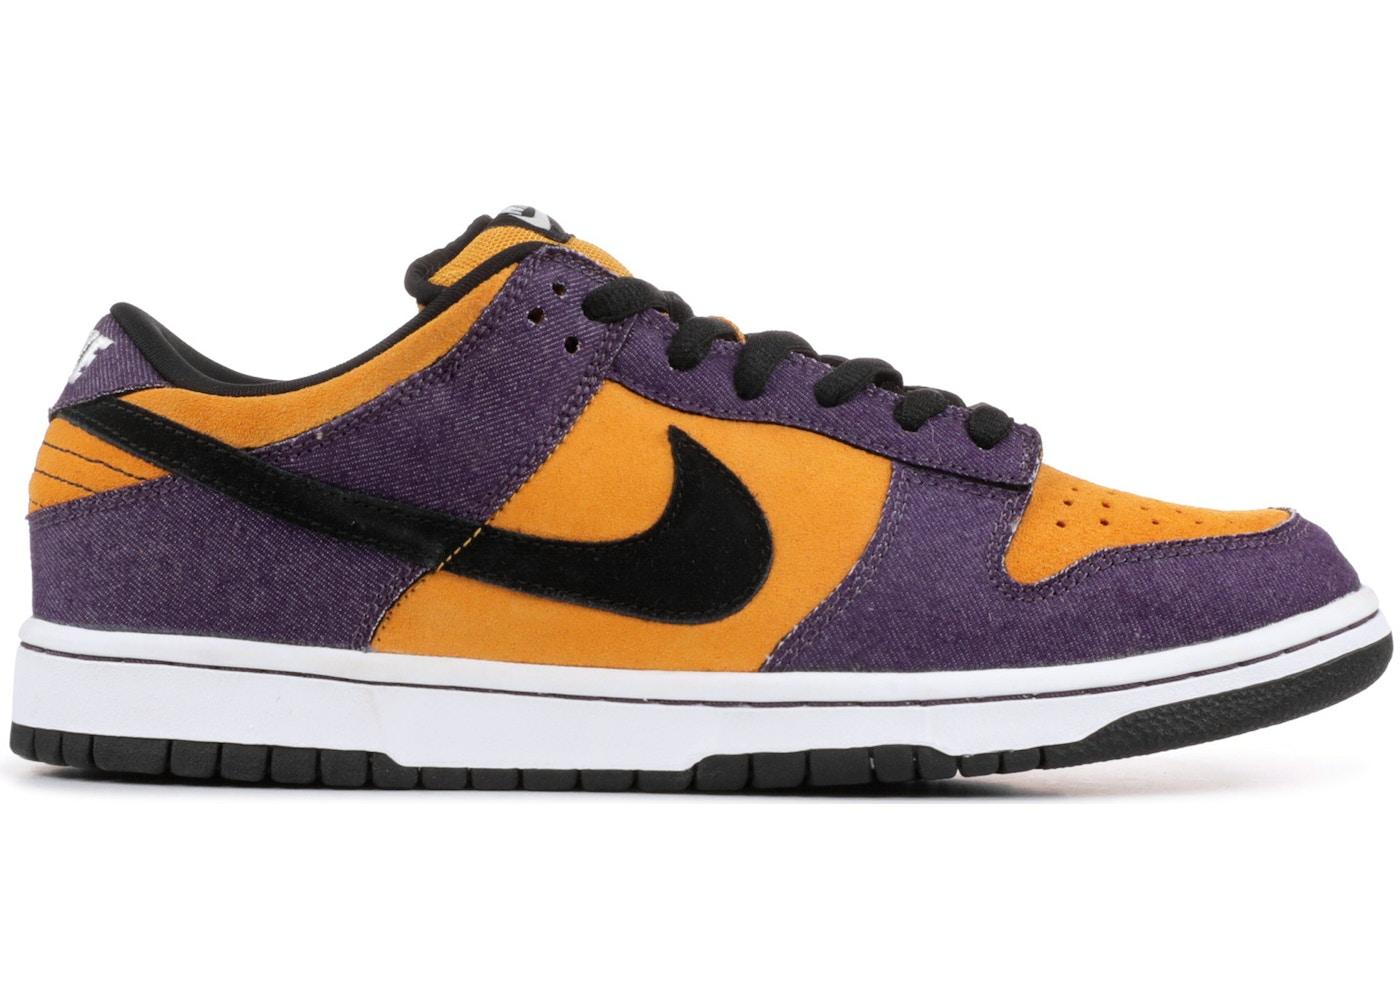 competitive price 24093 756d4 Nike SB SB Dunk Low Shoes - Price Premium